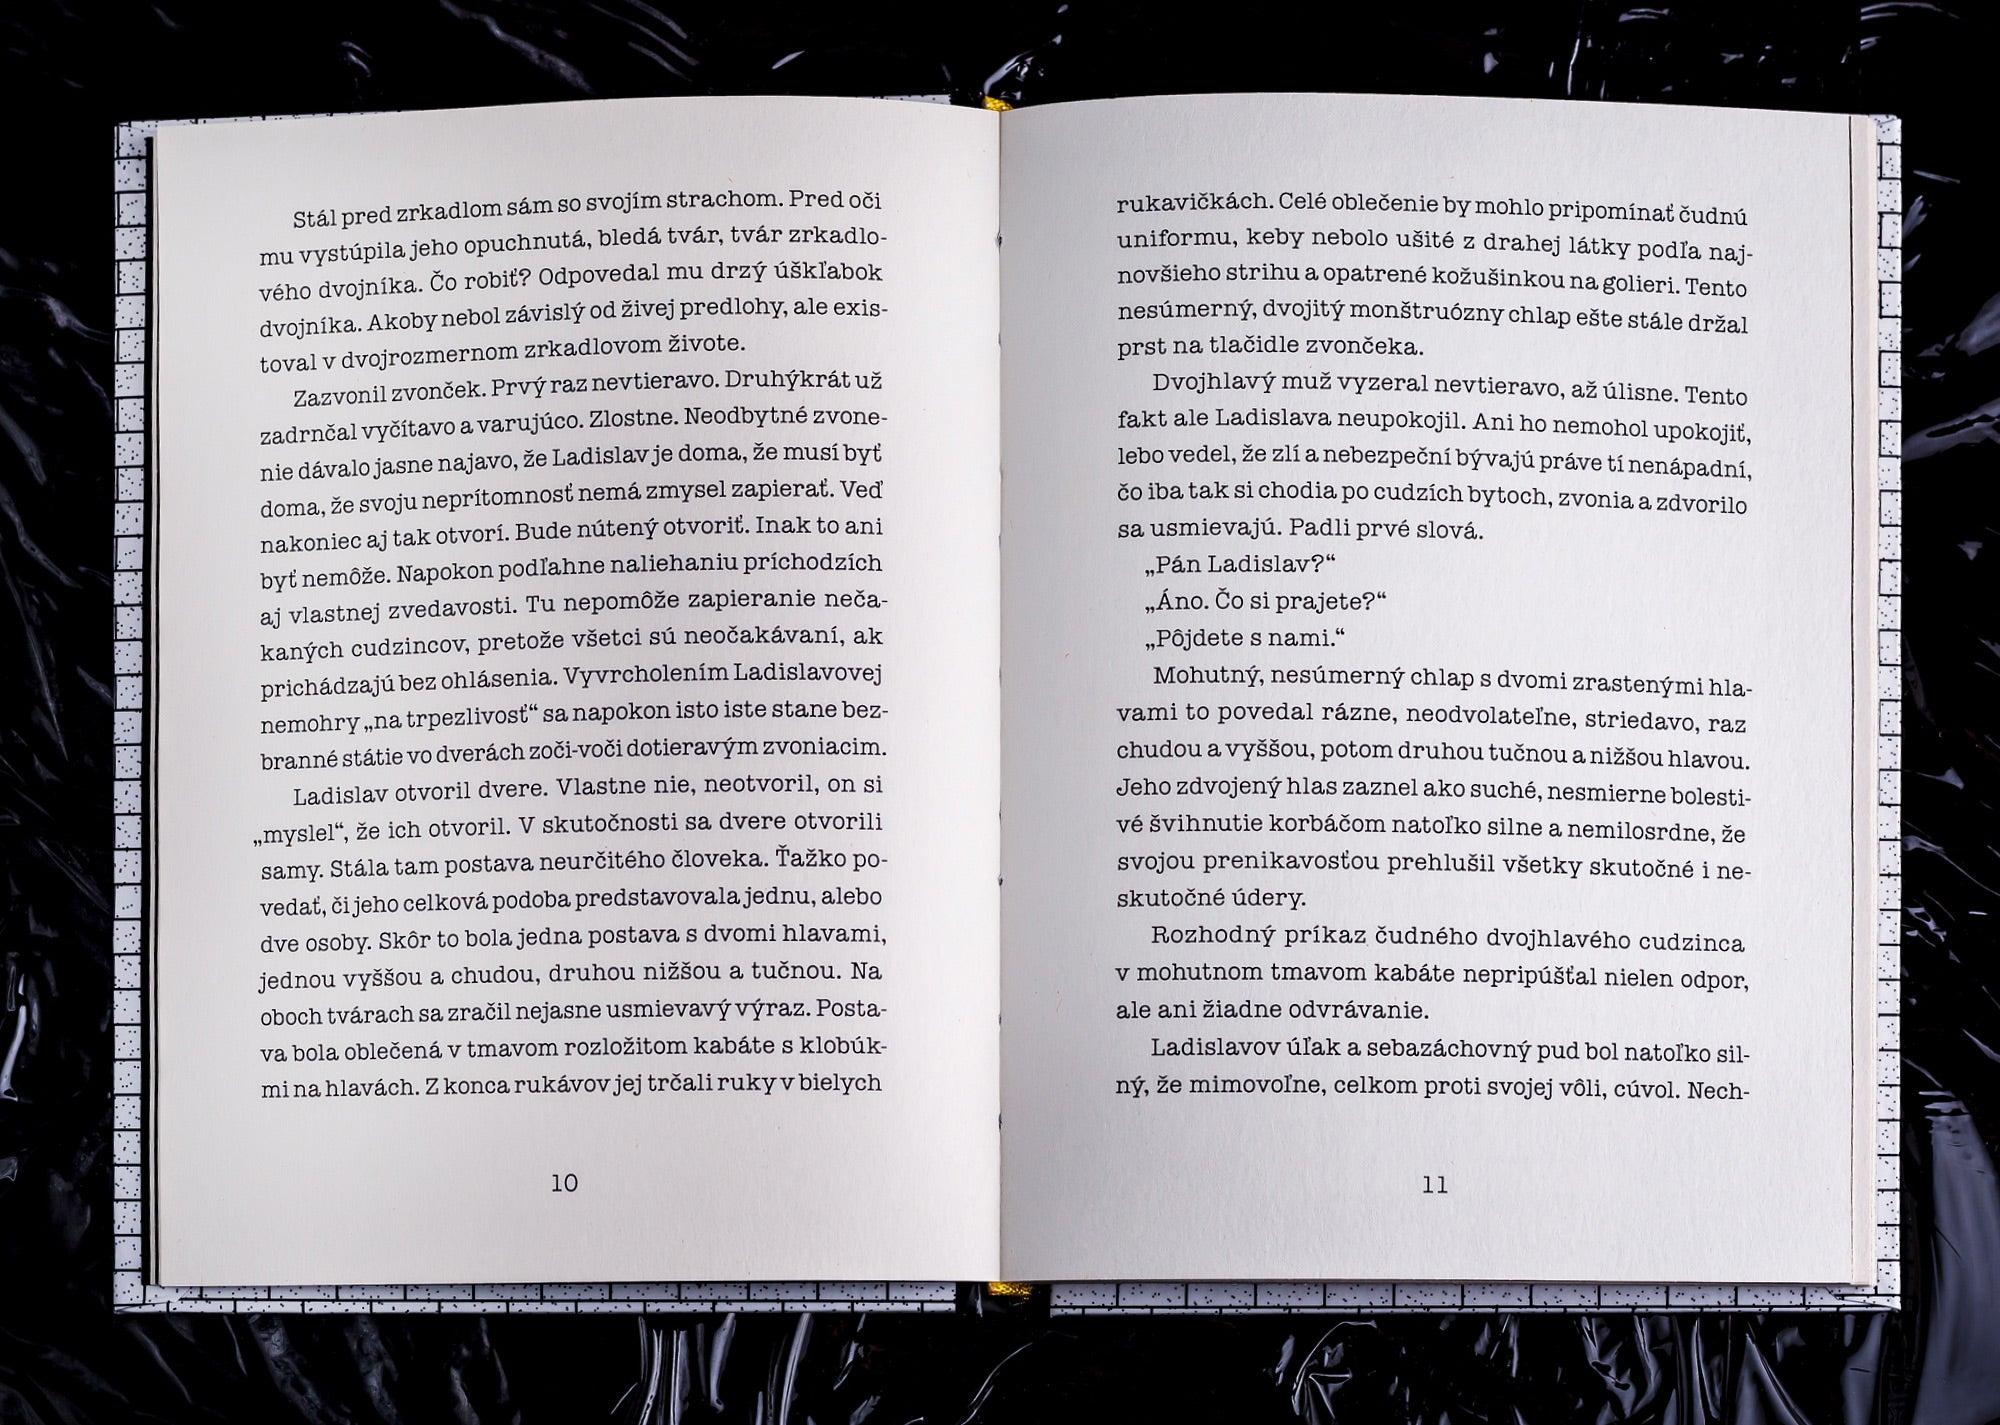 Ustav_06.jpg